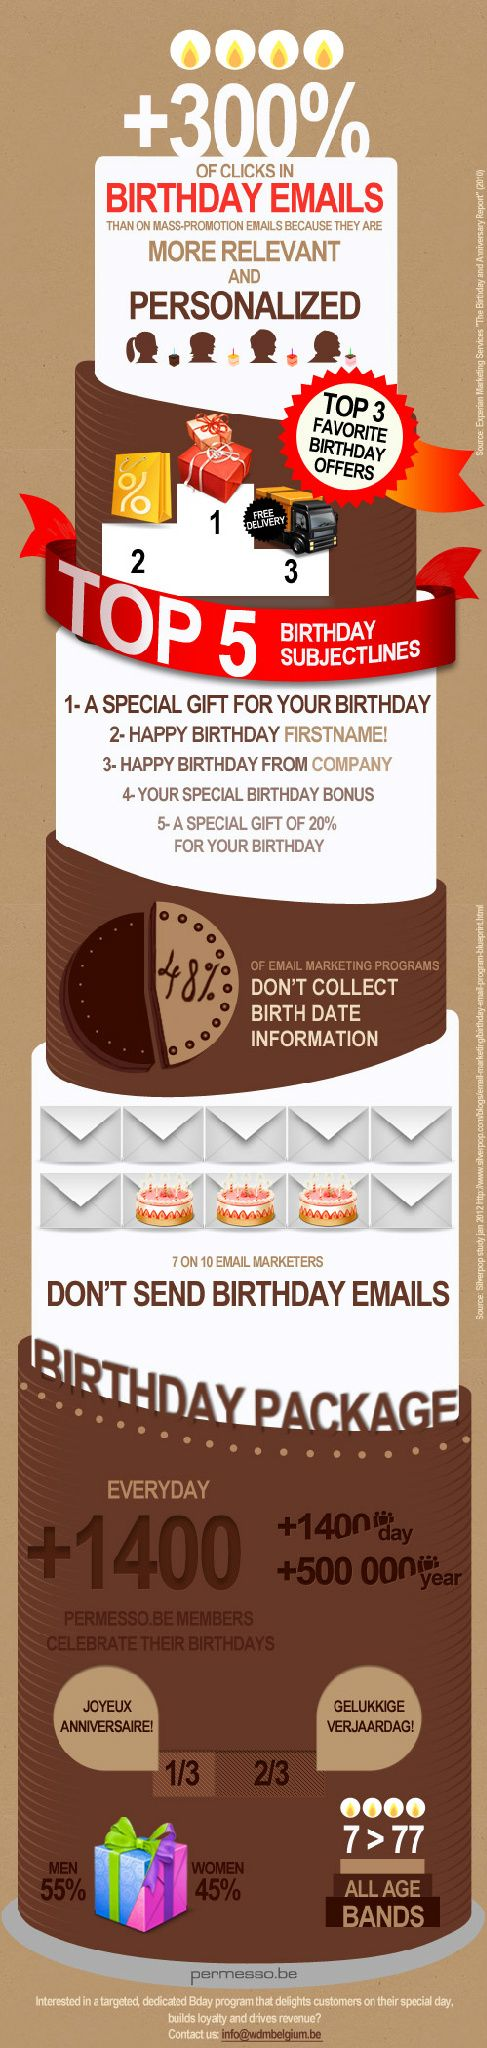 Email marketing and birthdays. #Email #Marketing